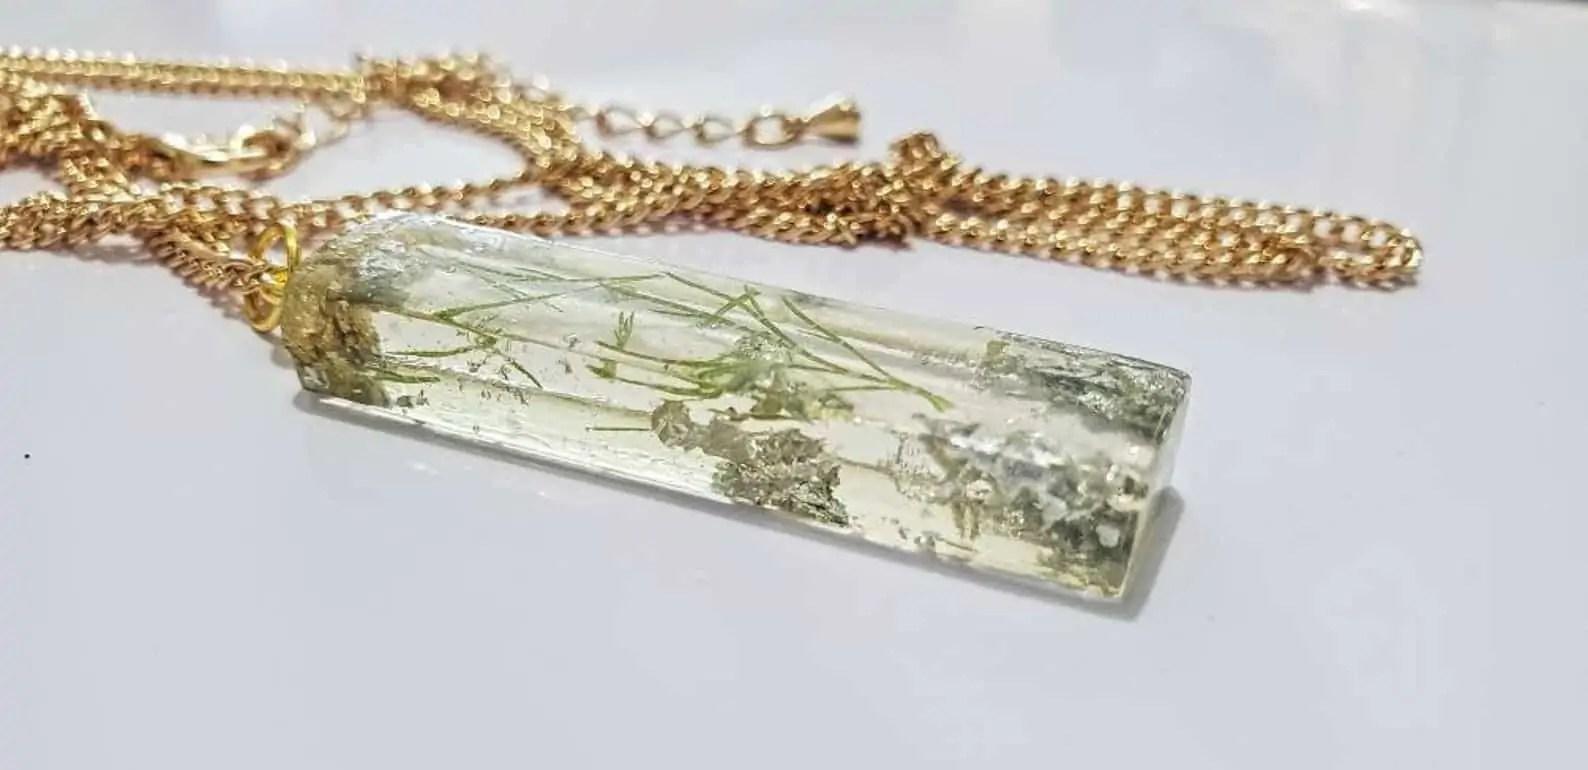 BounceBackJewelry | COLVIN: 3D Rectangle Resin Necklace Pendant | Black Etsy Seller from Canada